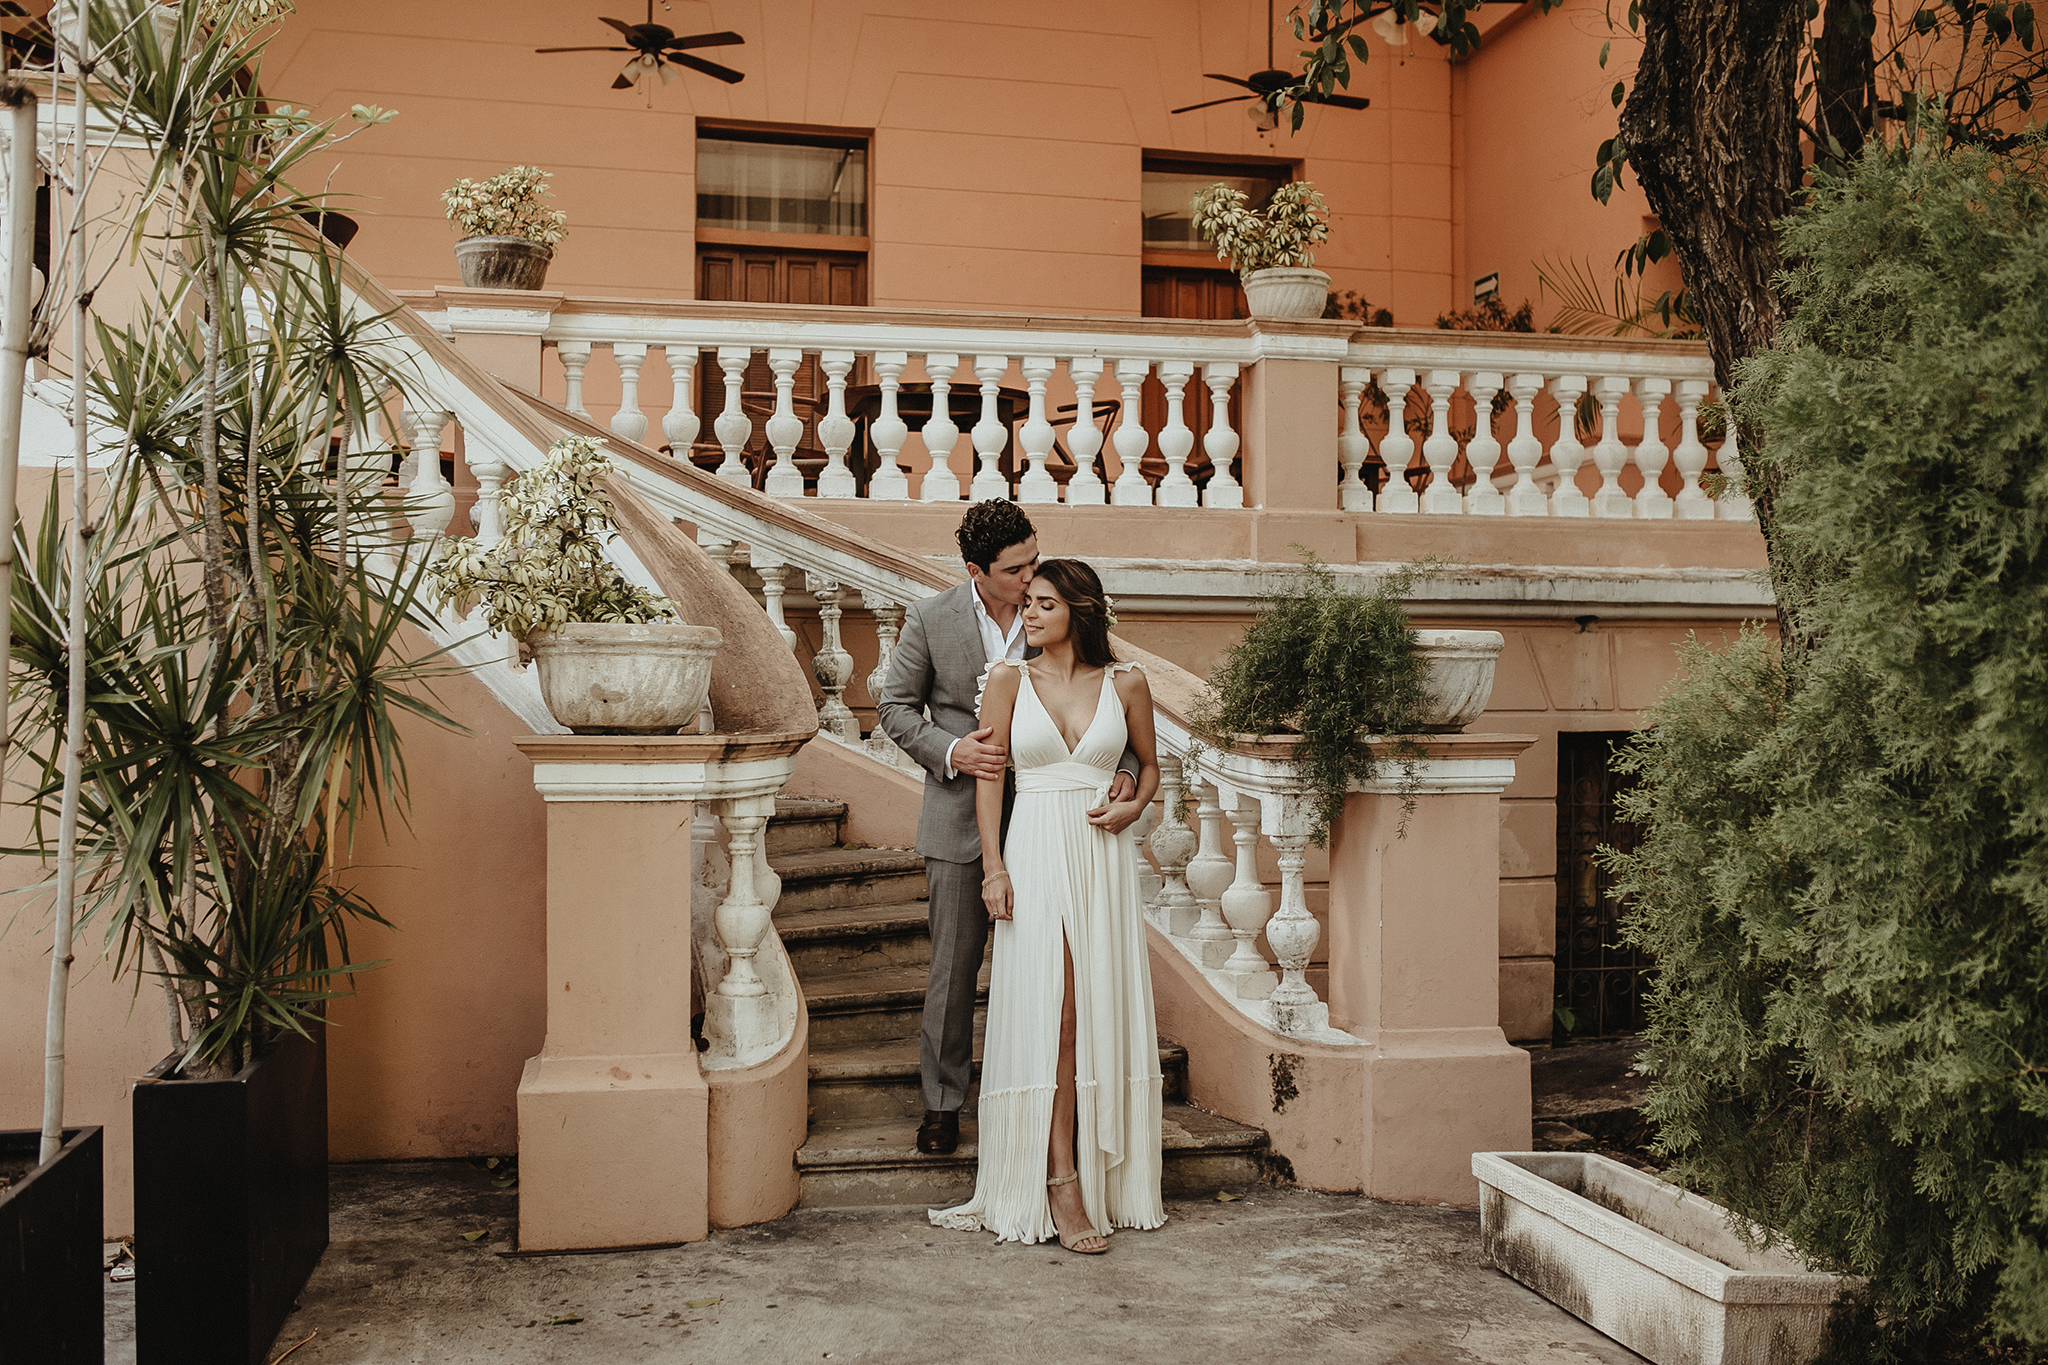 0010civil_Hacienda_WeddingDstination_MeridaYucatan_HaciendasMerida_BodasMexico_BodasYucatan_Boda_Destino.jpg